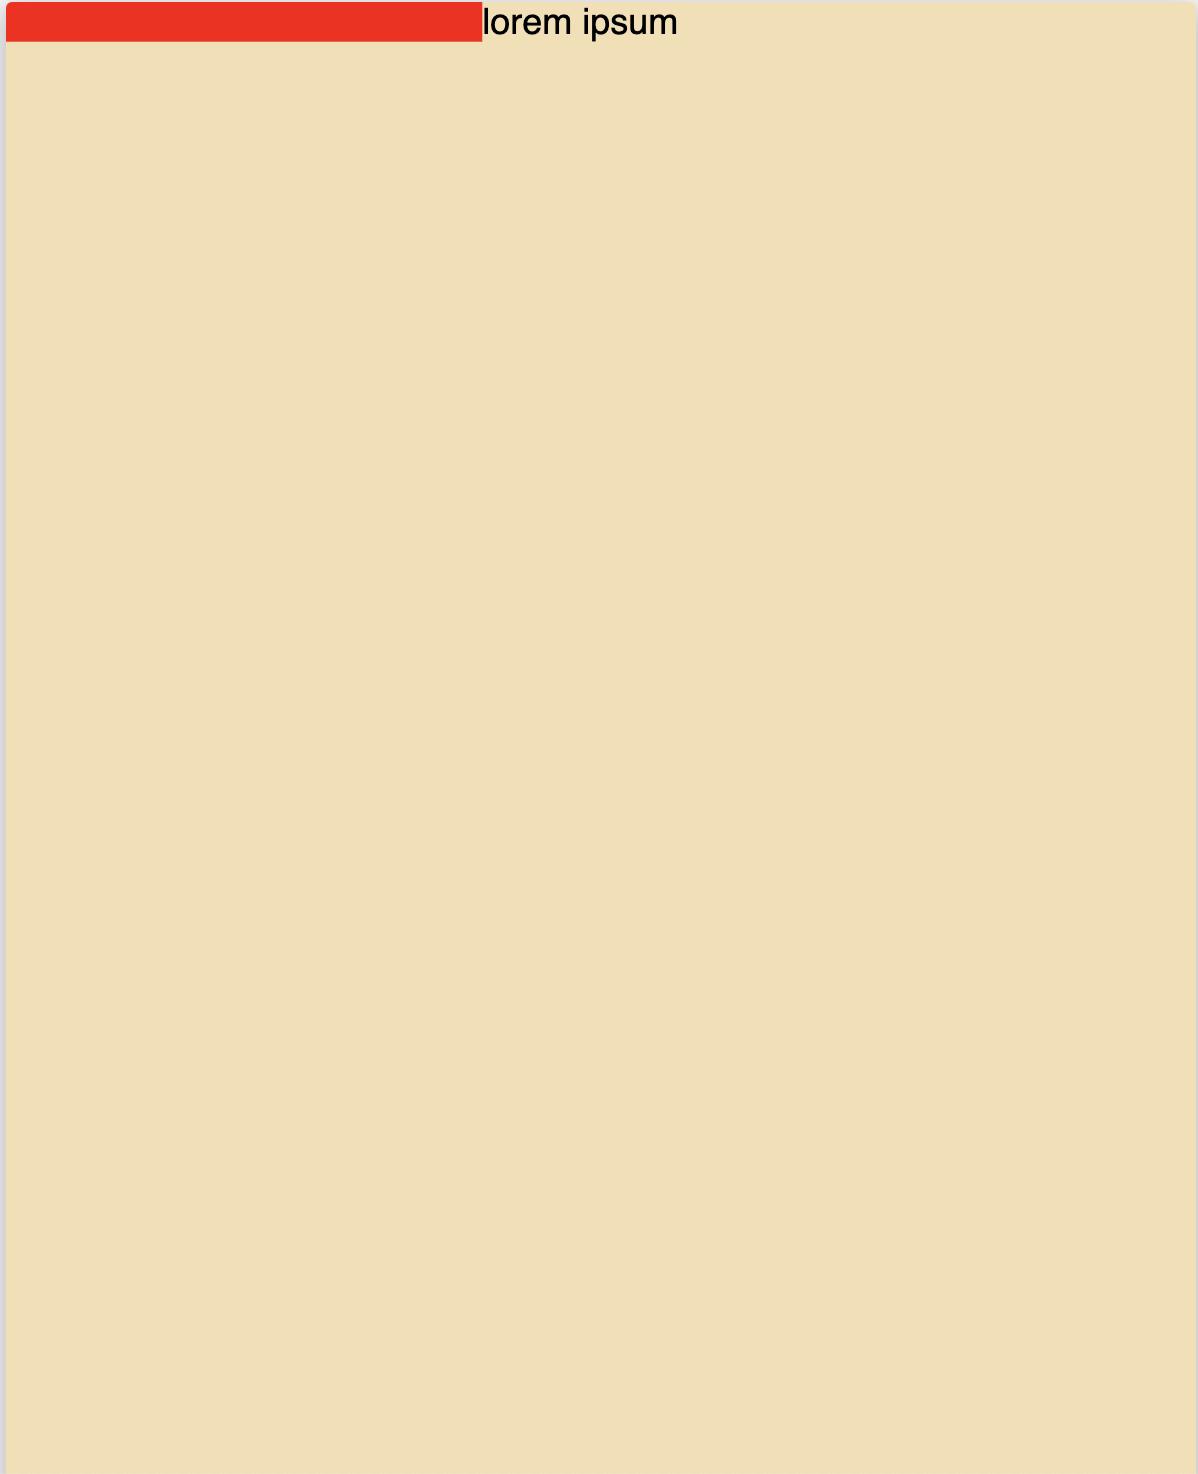 Снимок экрана 2021-09-16 в 11 19 41